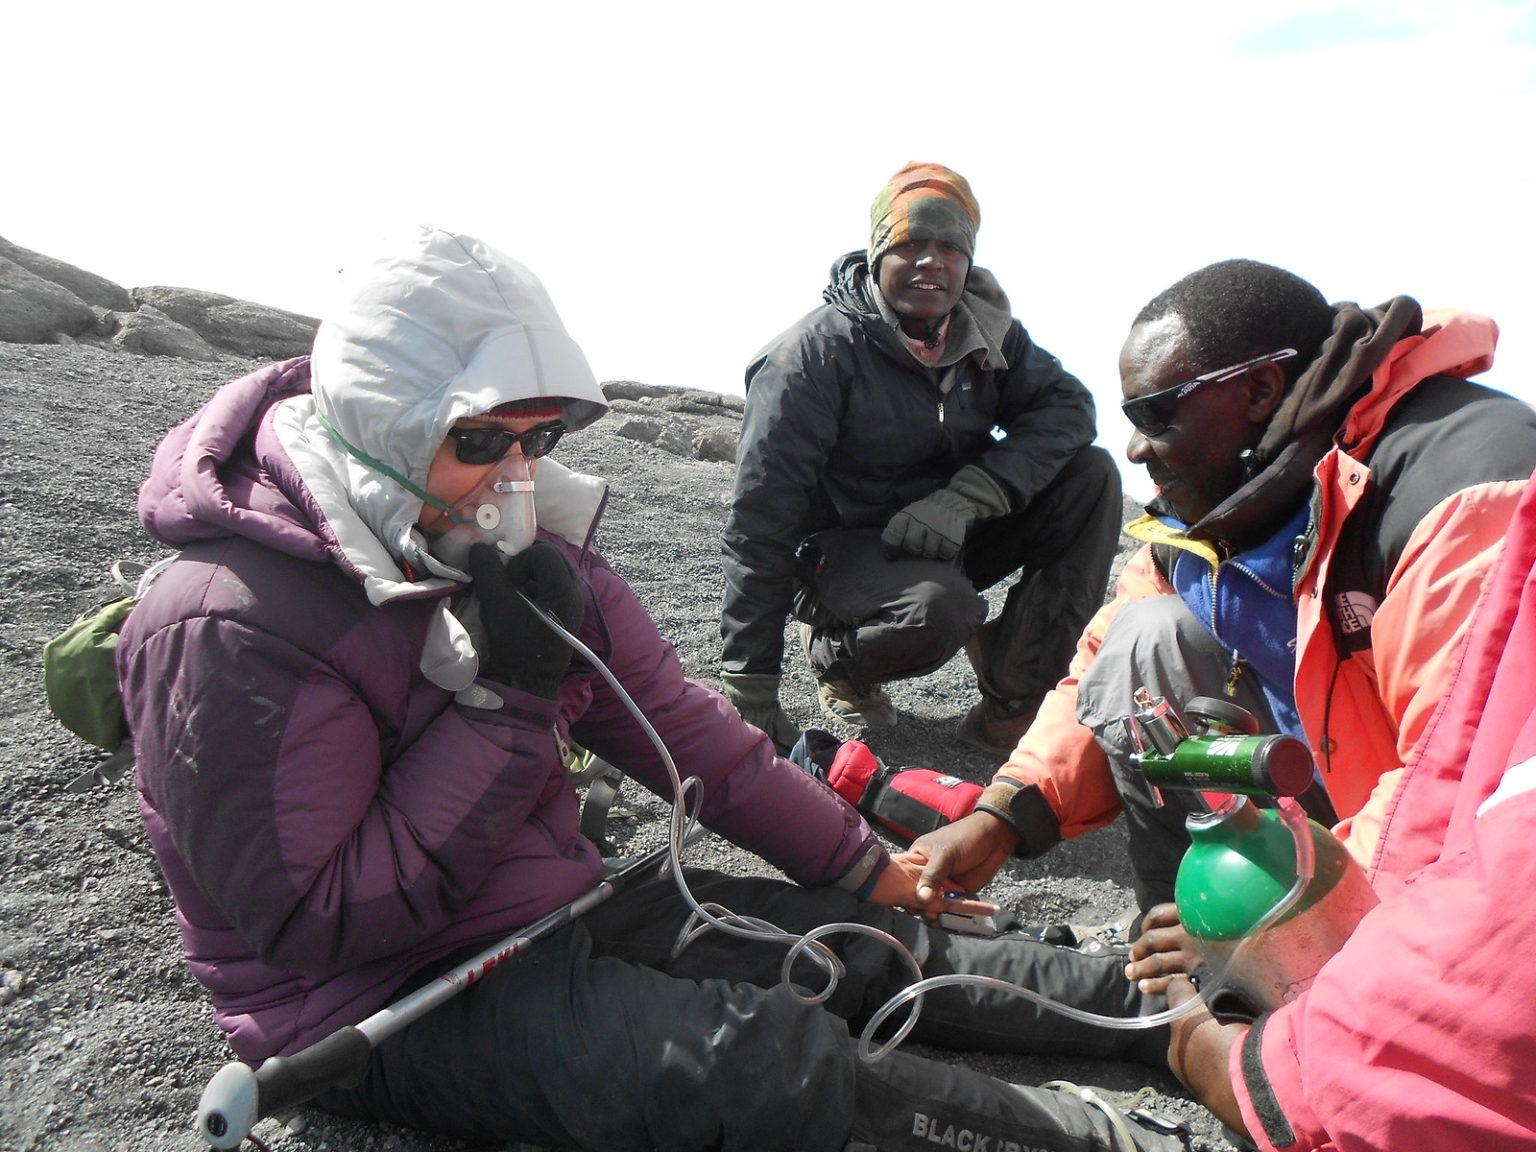 Kilimanjaro oxygen rescue